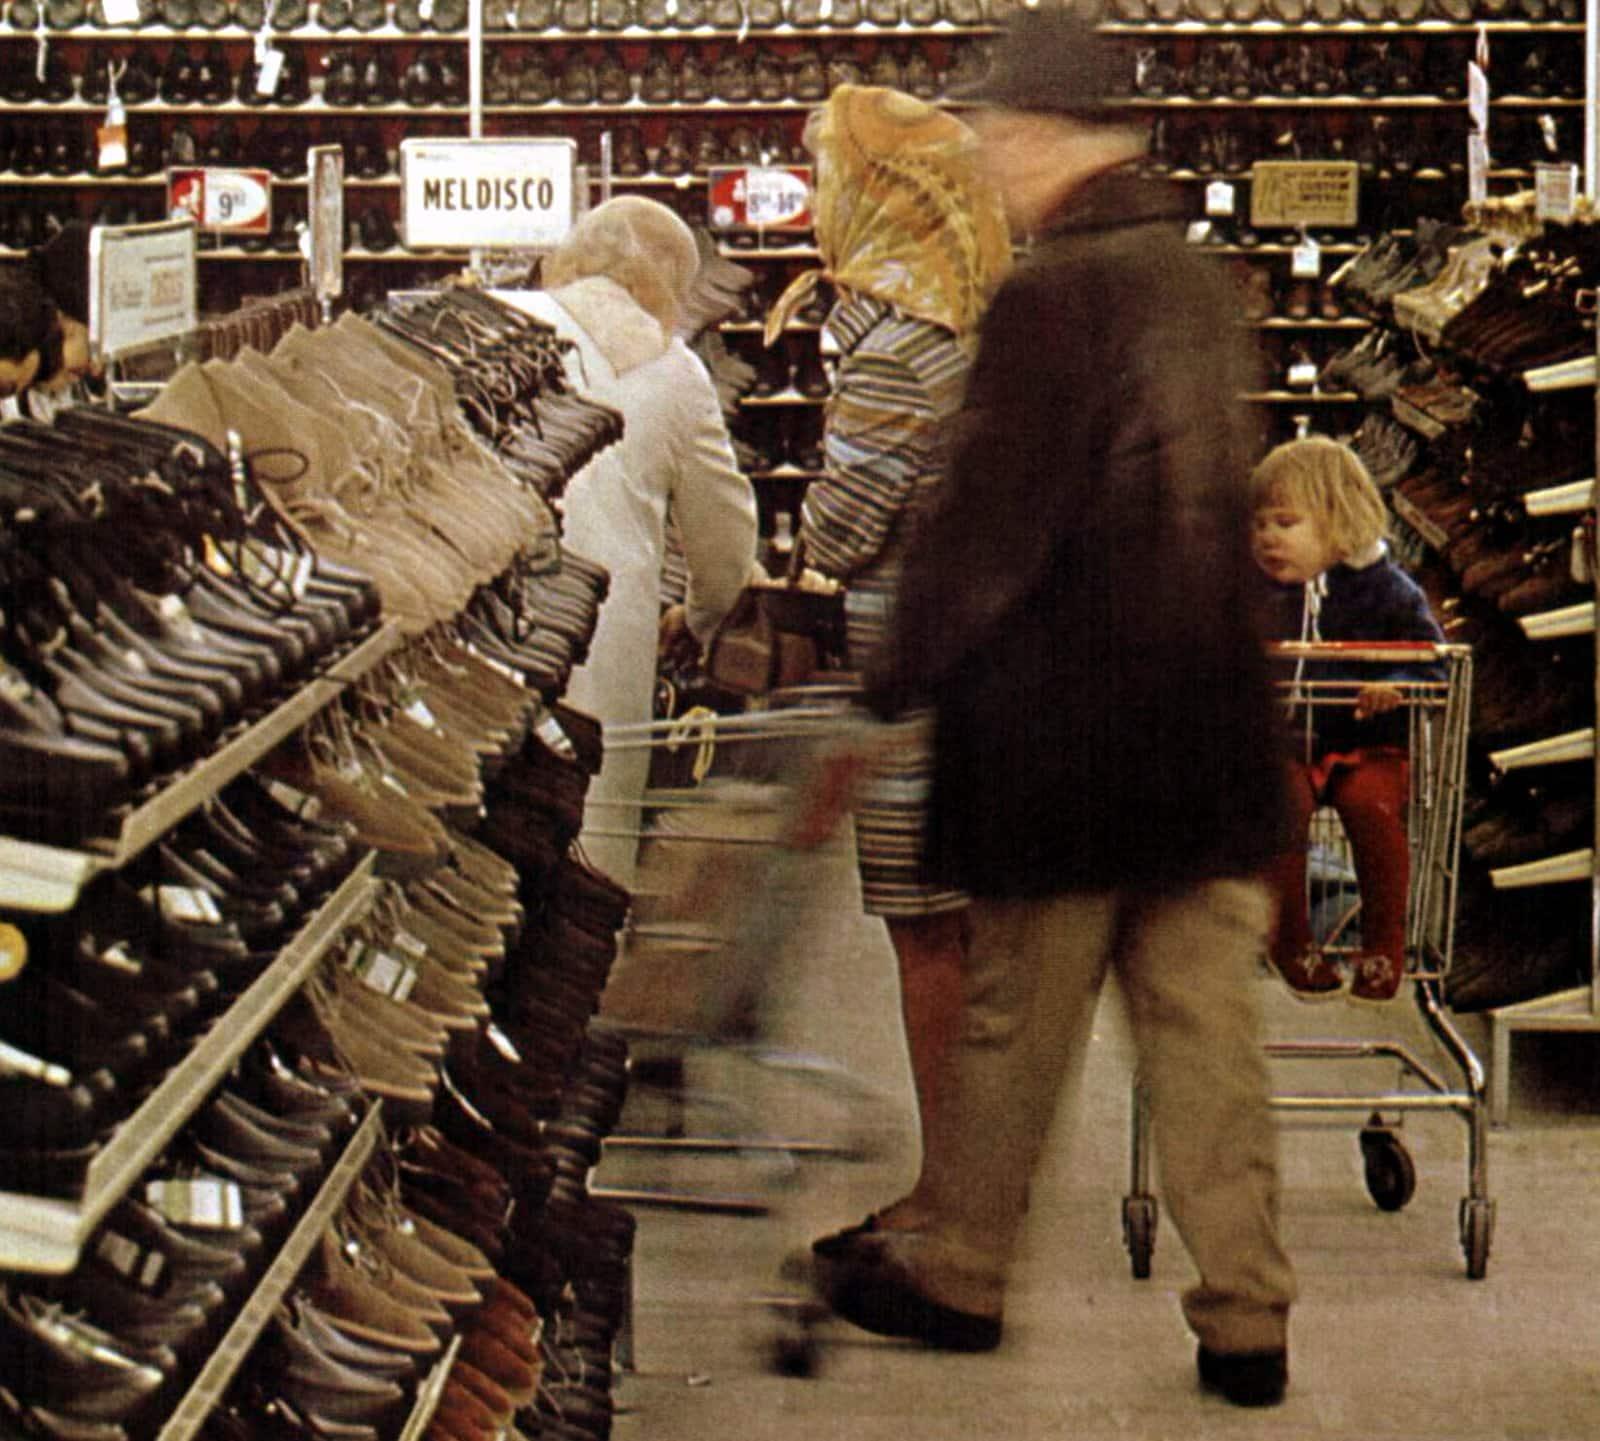 Self-serve Melville shoe store (1968)